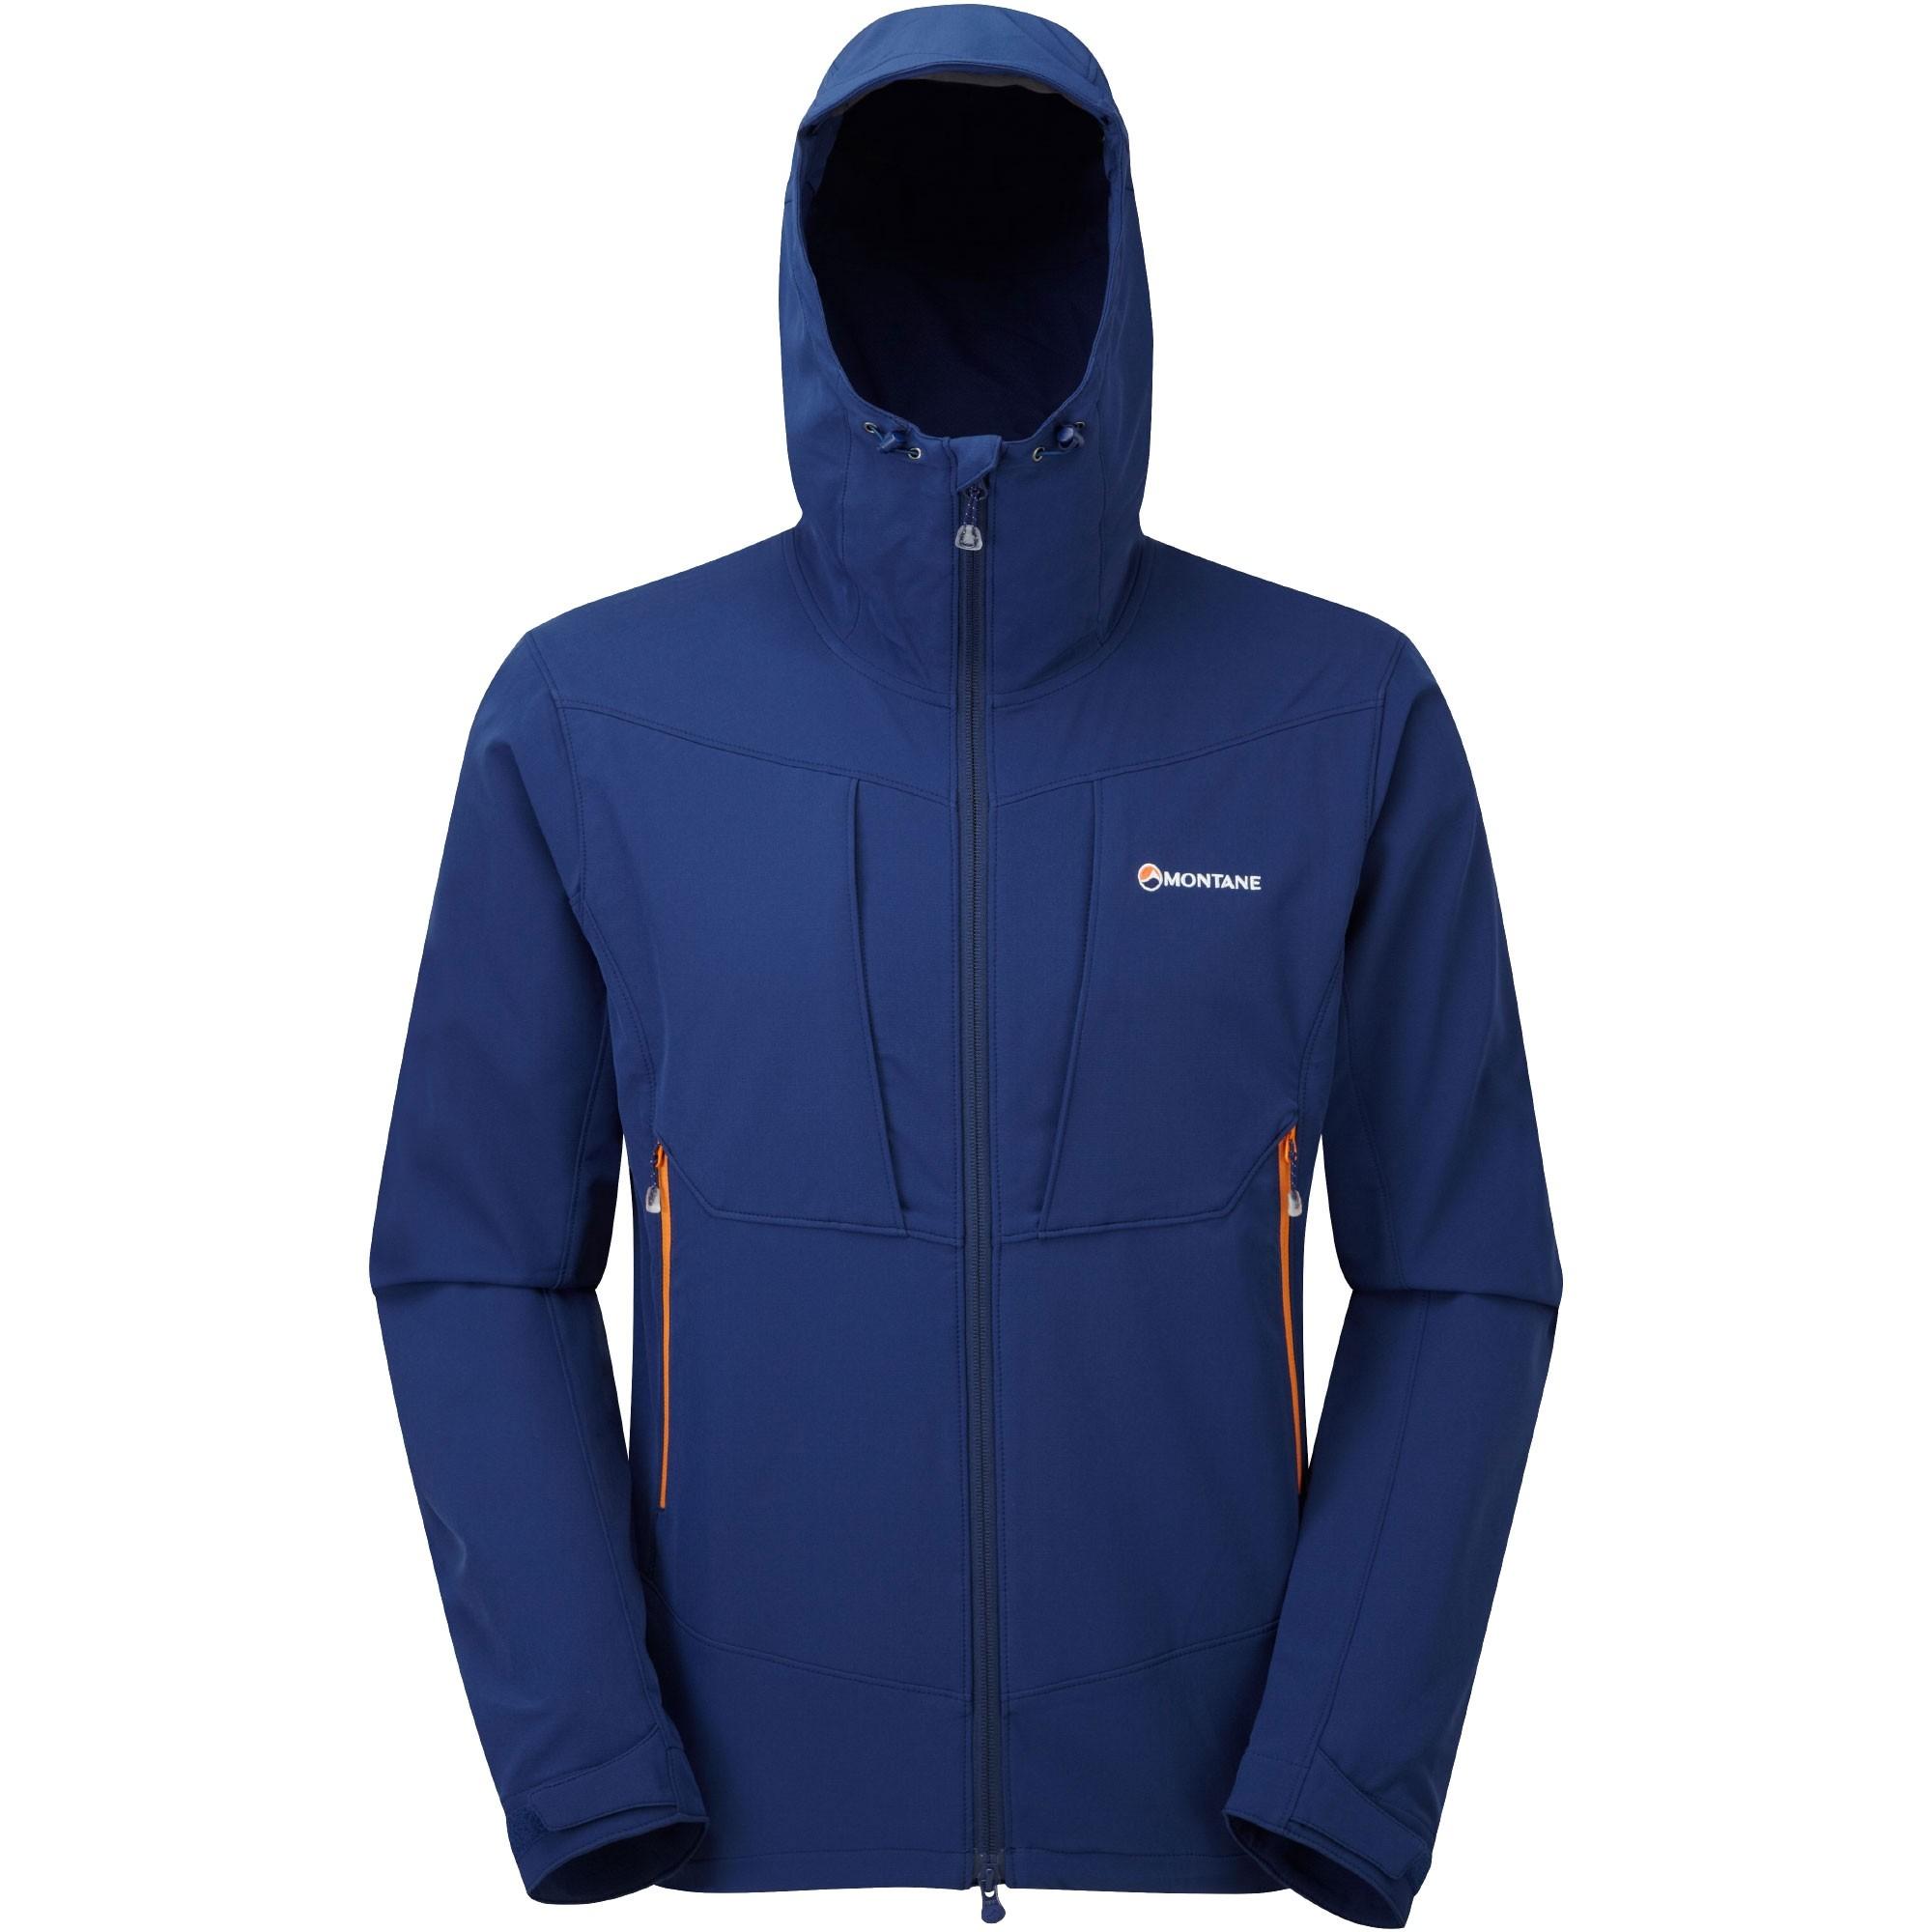 Montane Dyno Stretch Jacket - Antarctic Blue - hood up